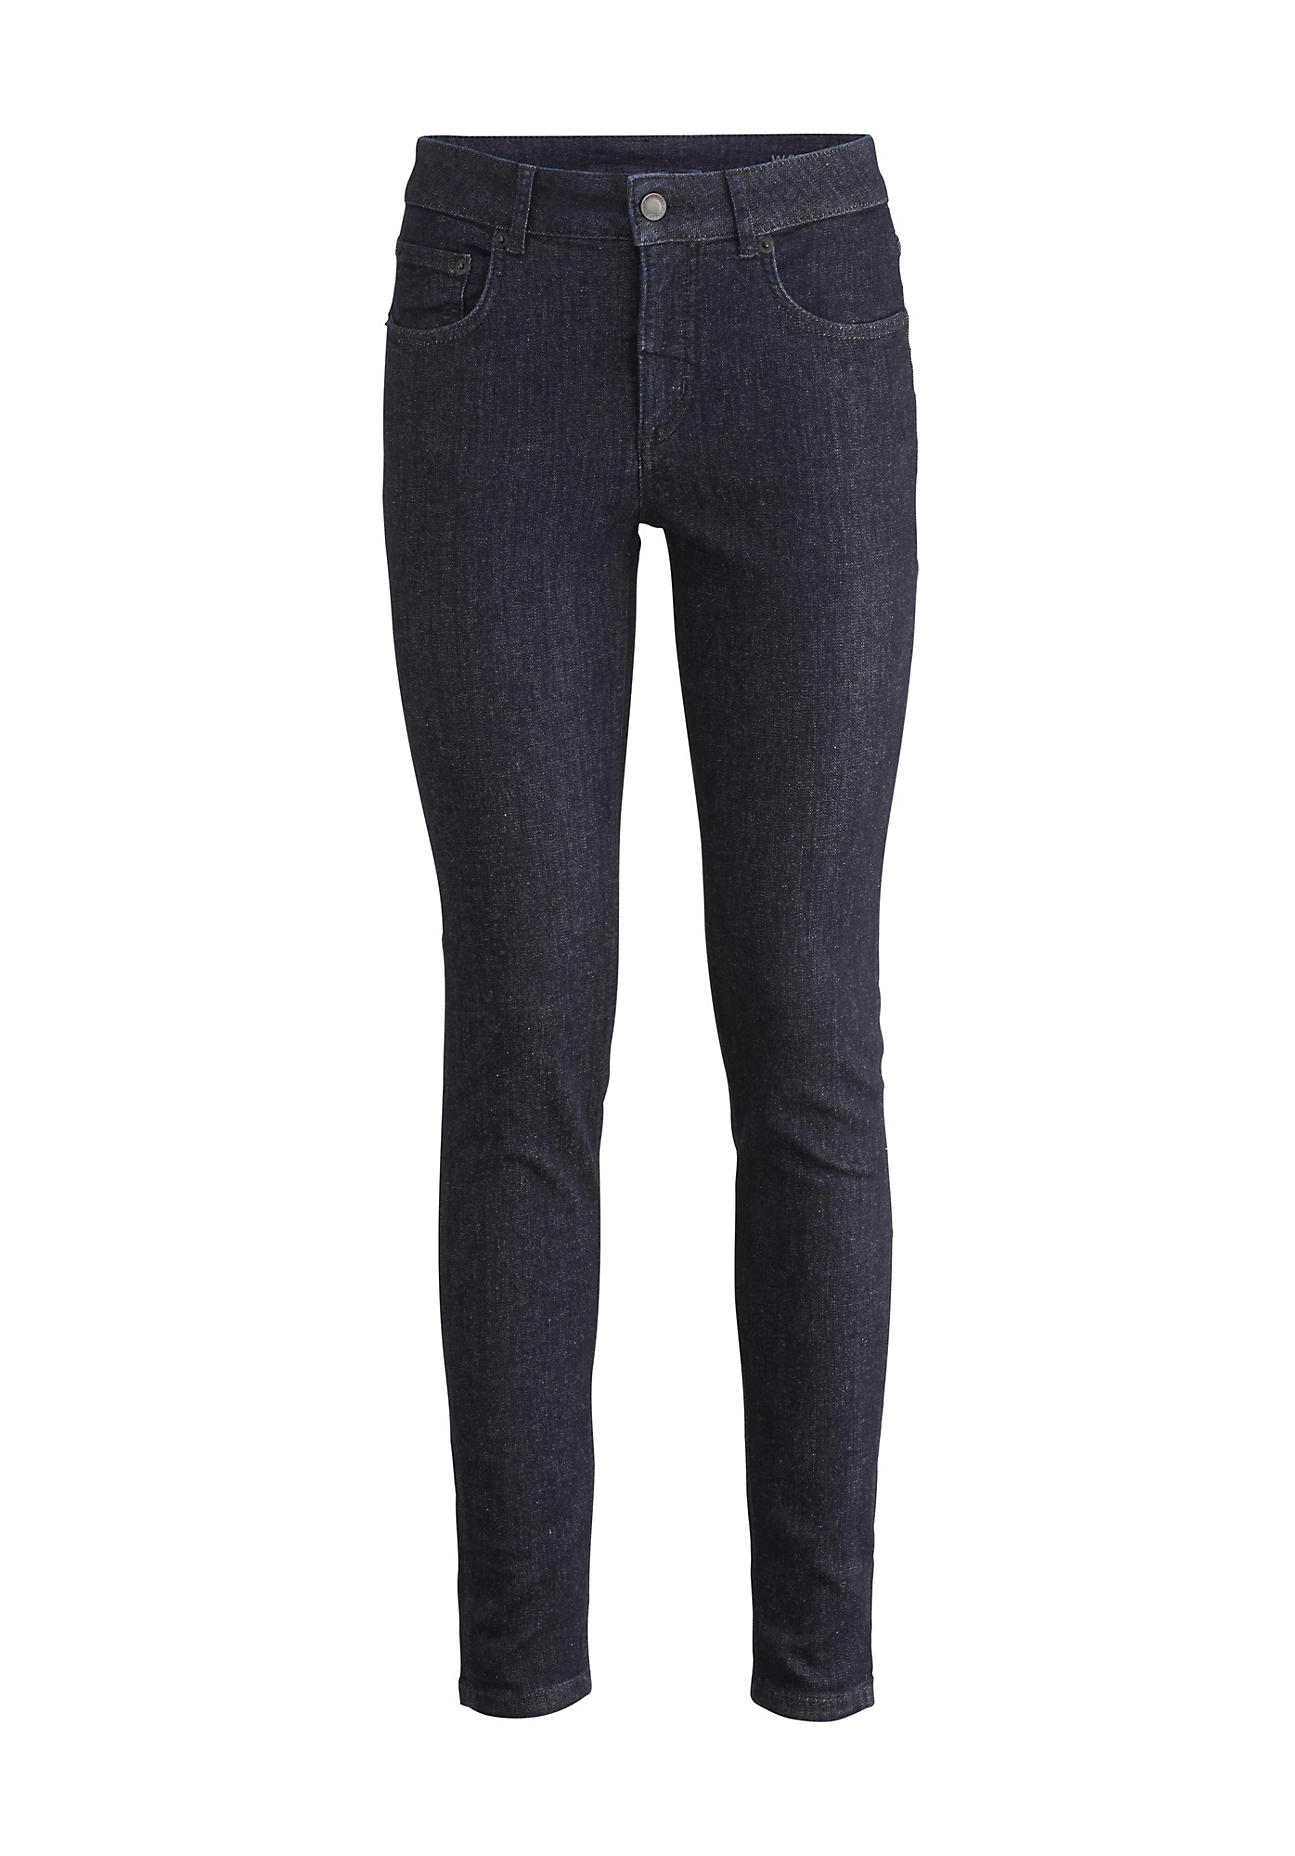 hessnatur Damen Jeans Lina Skinny Fit aus Bio-Denim – blau – Größe 26/30